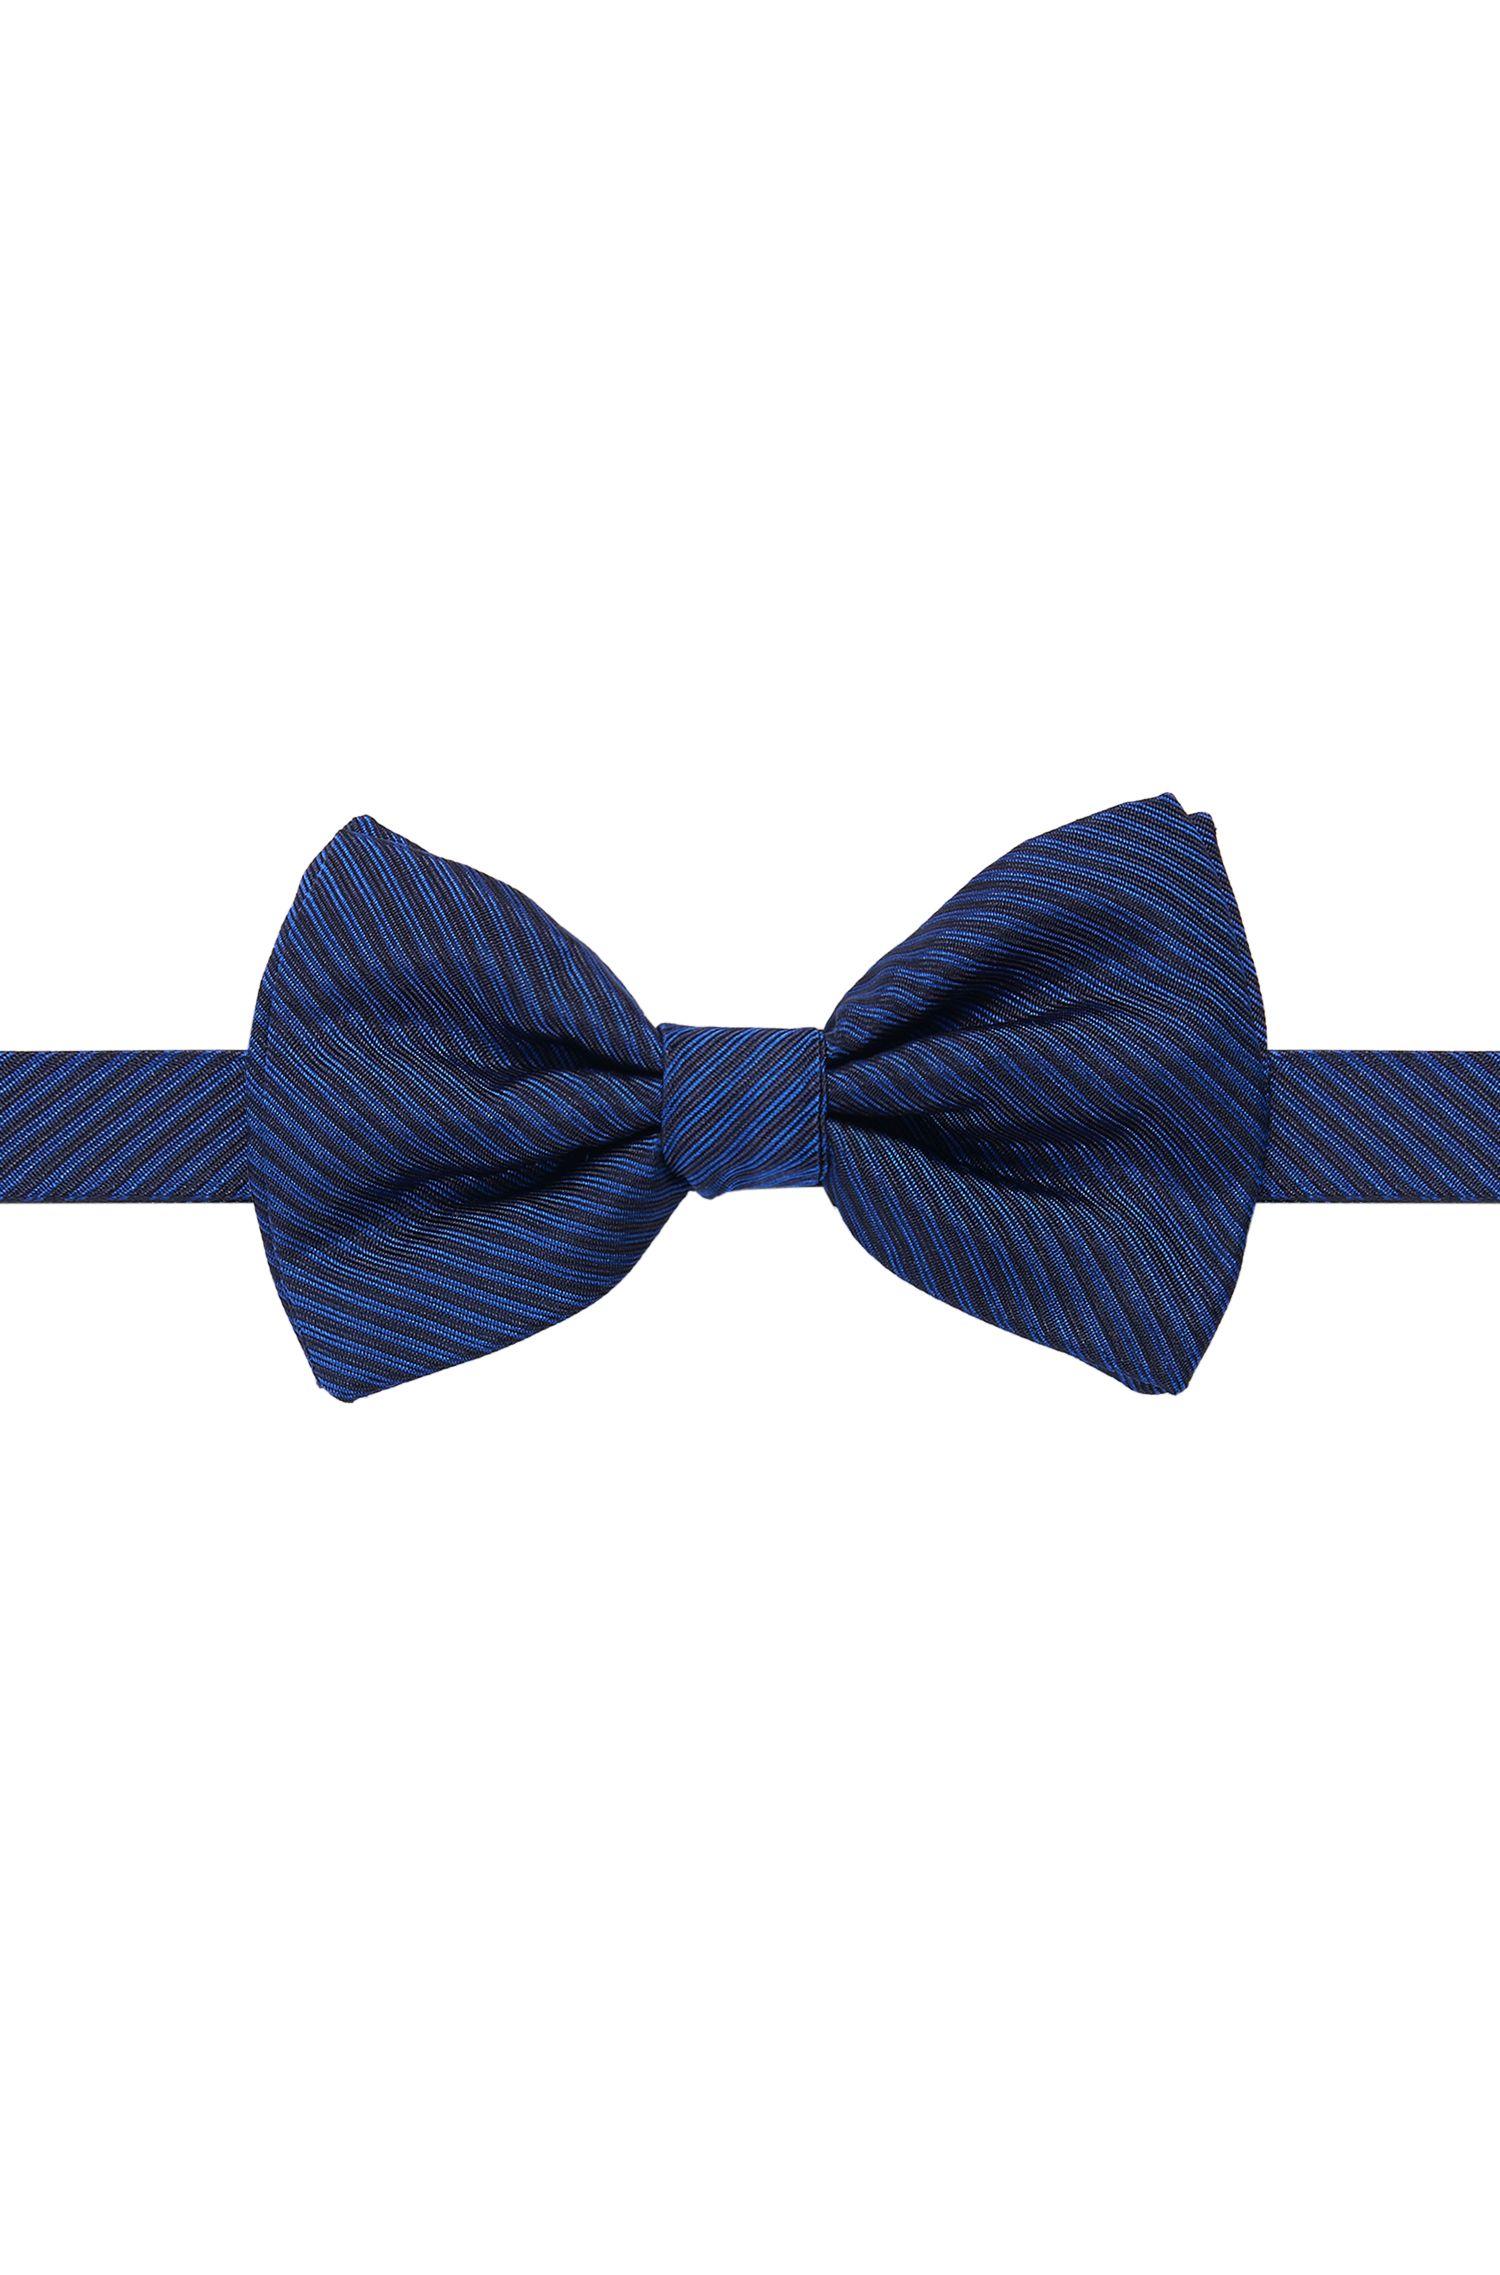 'T-Bow Tie Classic' | Silk Tied Bow Tie